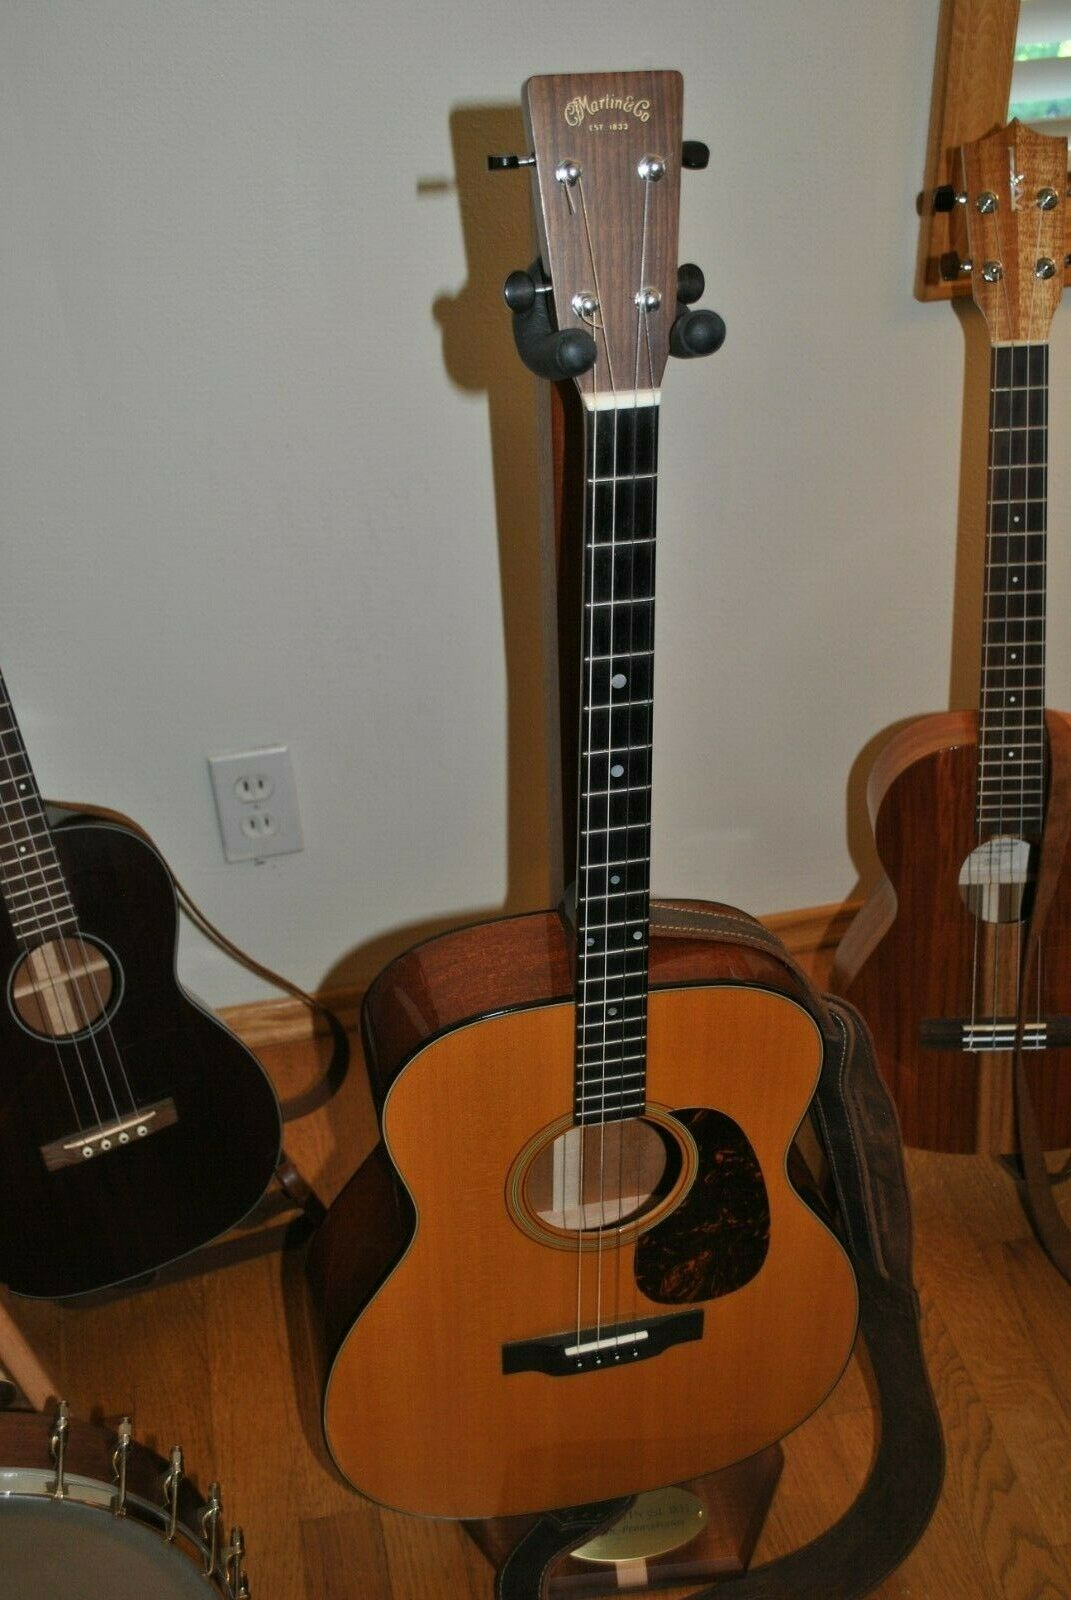 s l1600 - 2012 Martin 018-t tenor guitar with case